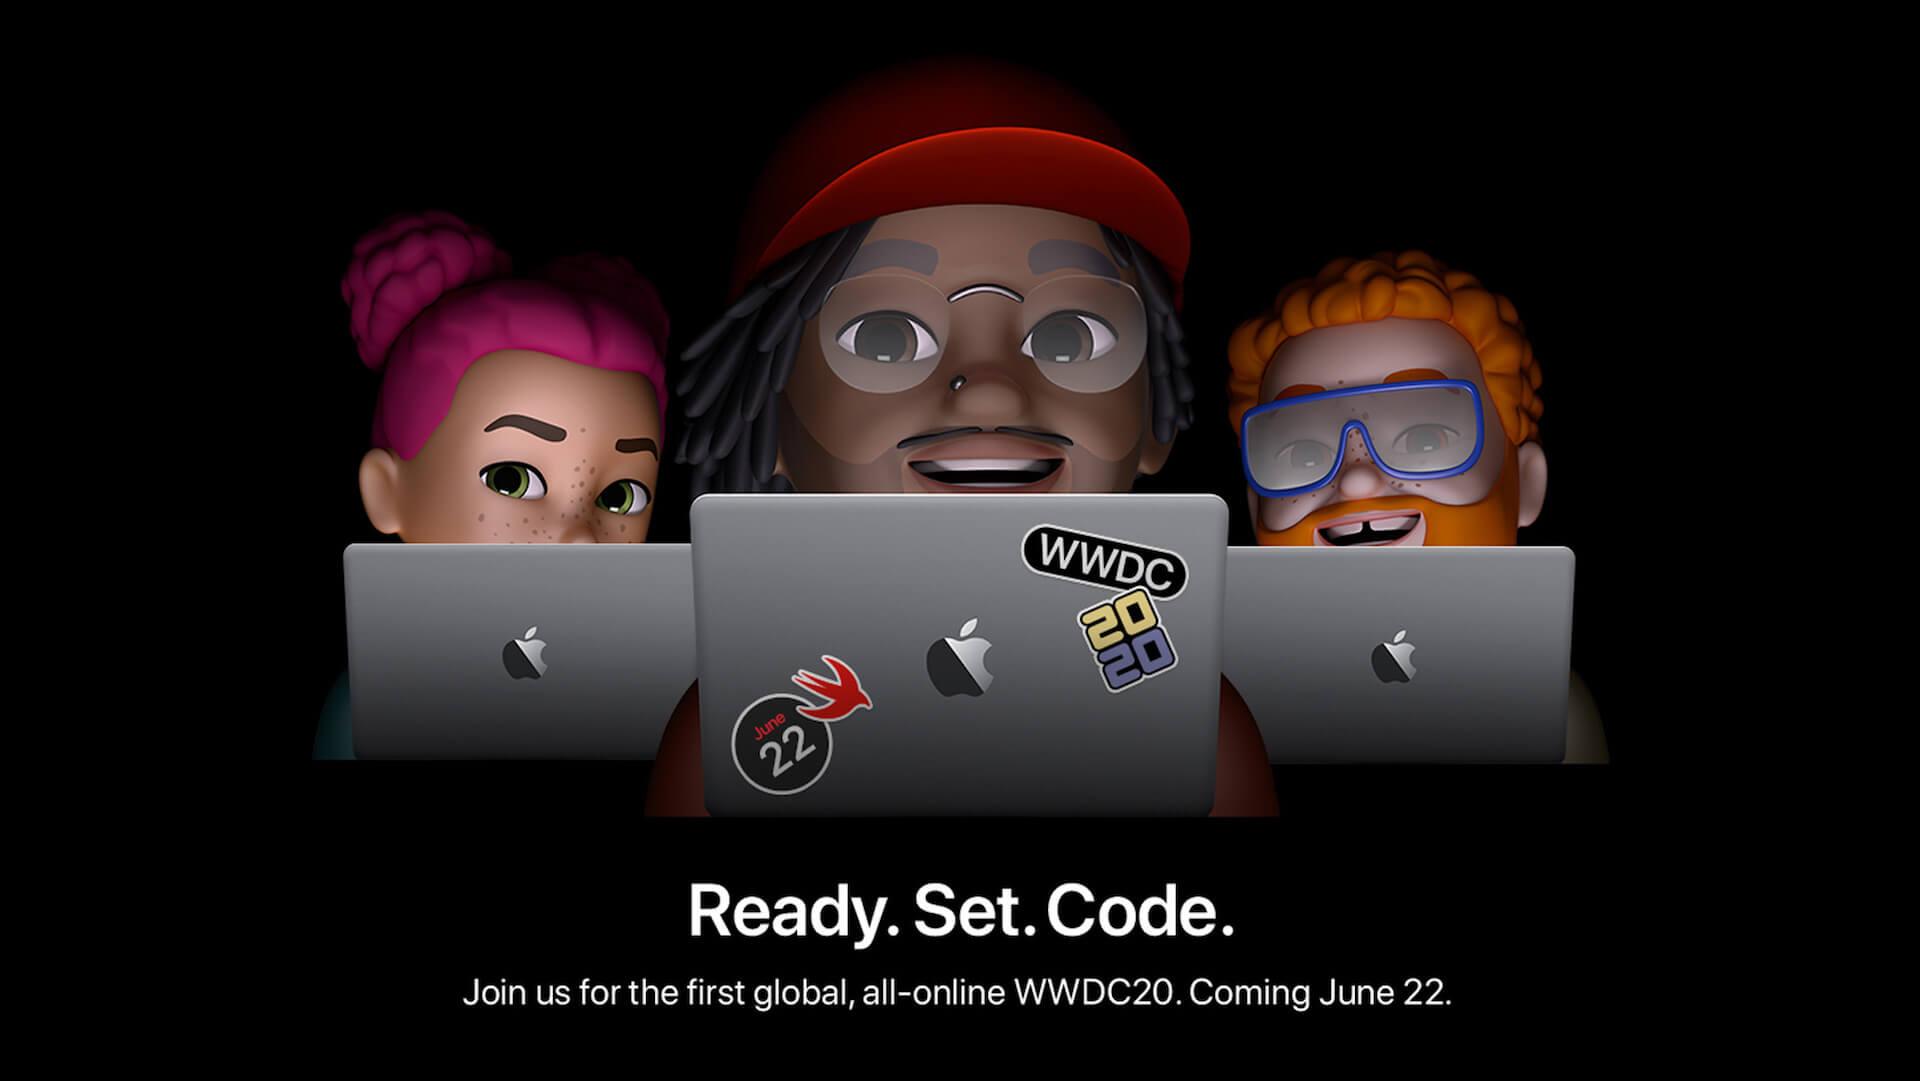 Appleが<WWDC>開催を発表!新型AirPods、iMac登場の可能性も? tech200507_apple_wwdc_1